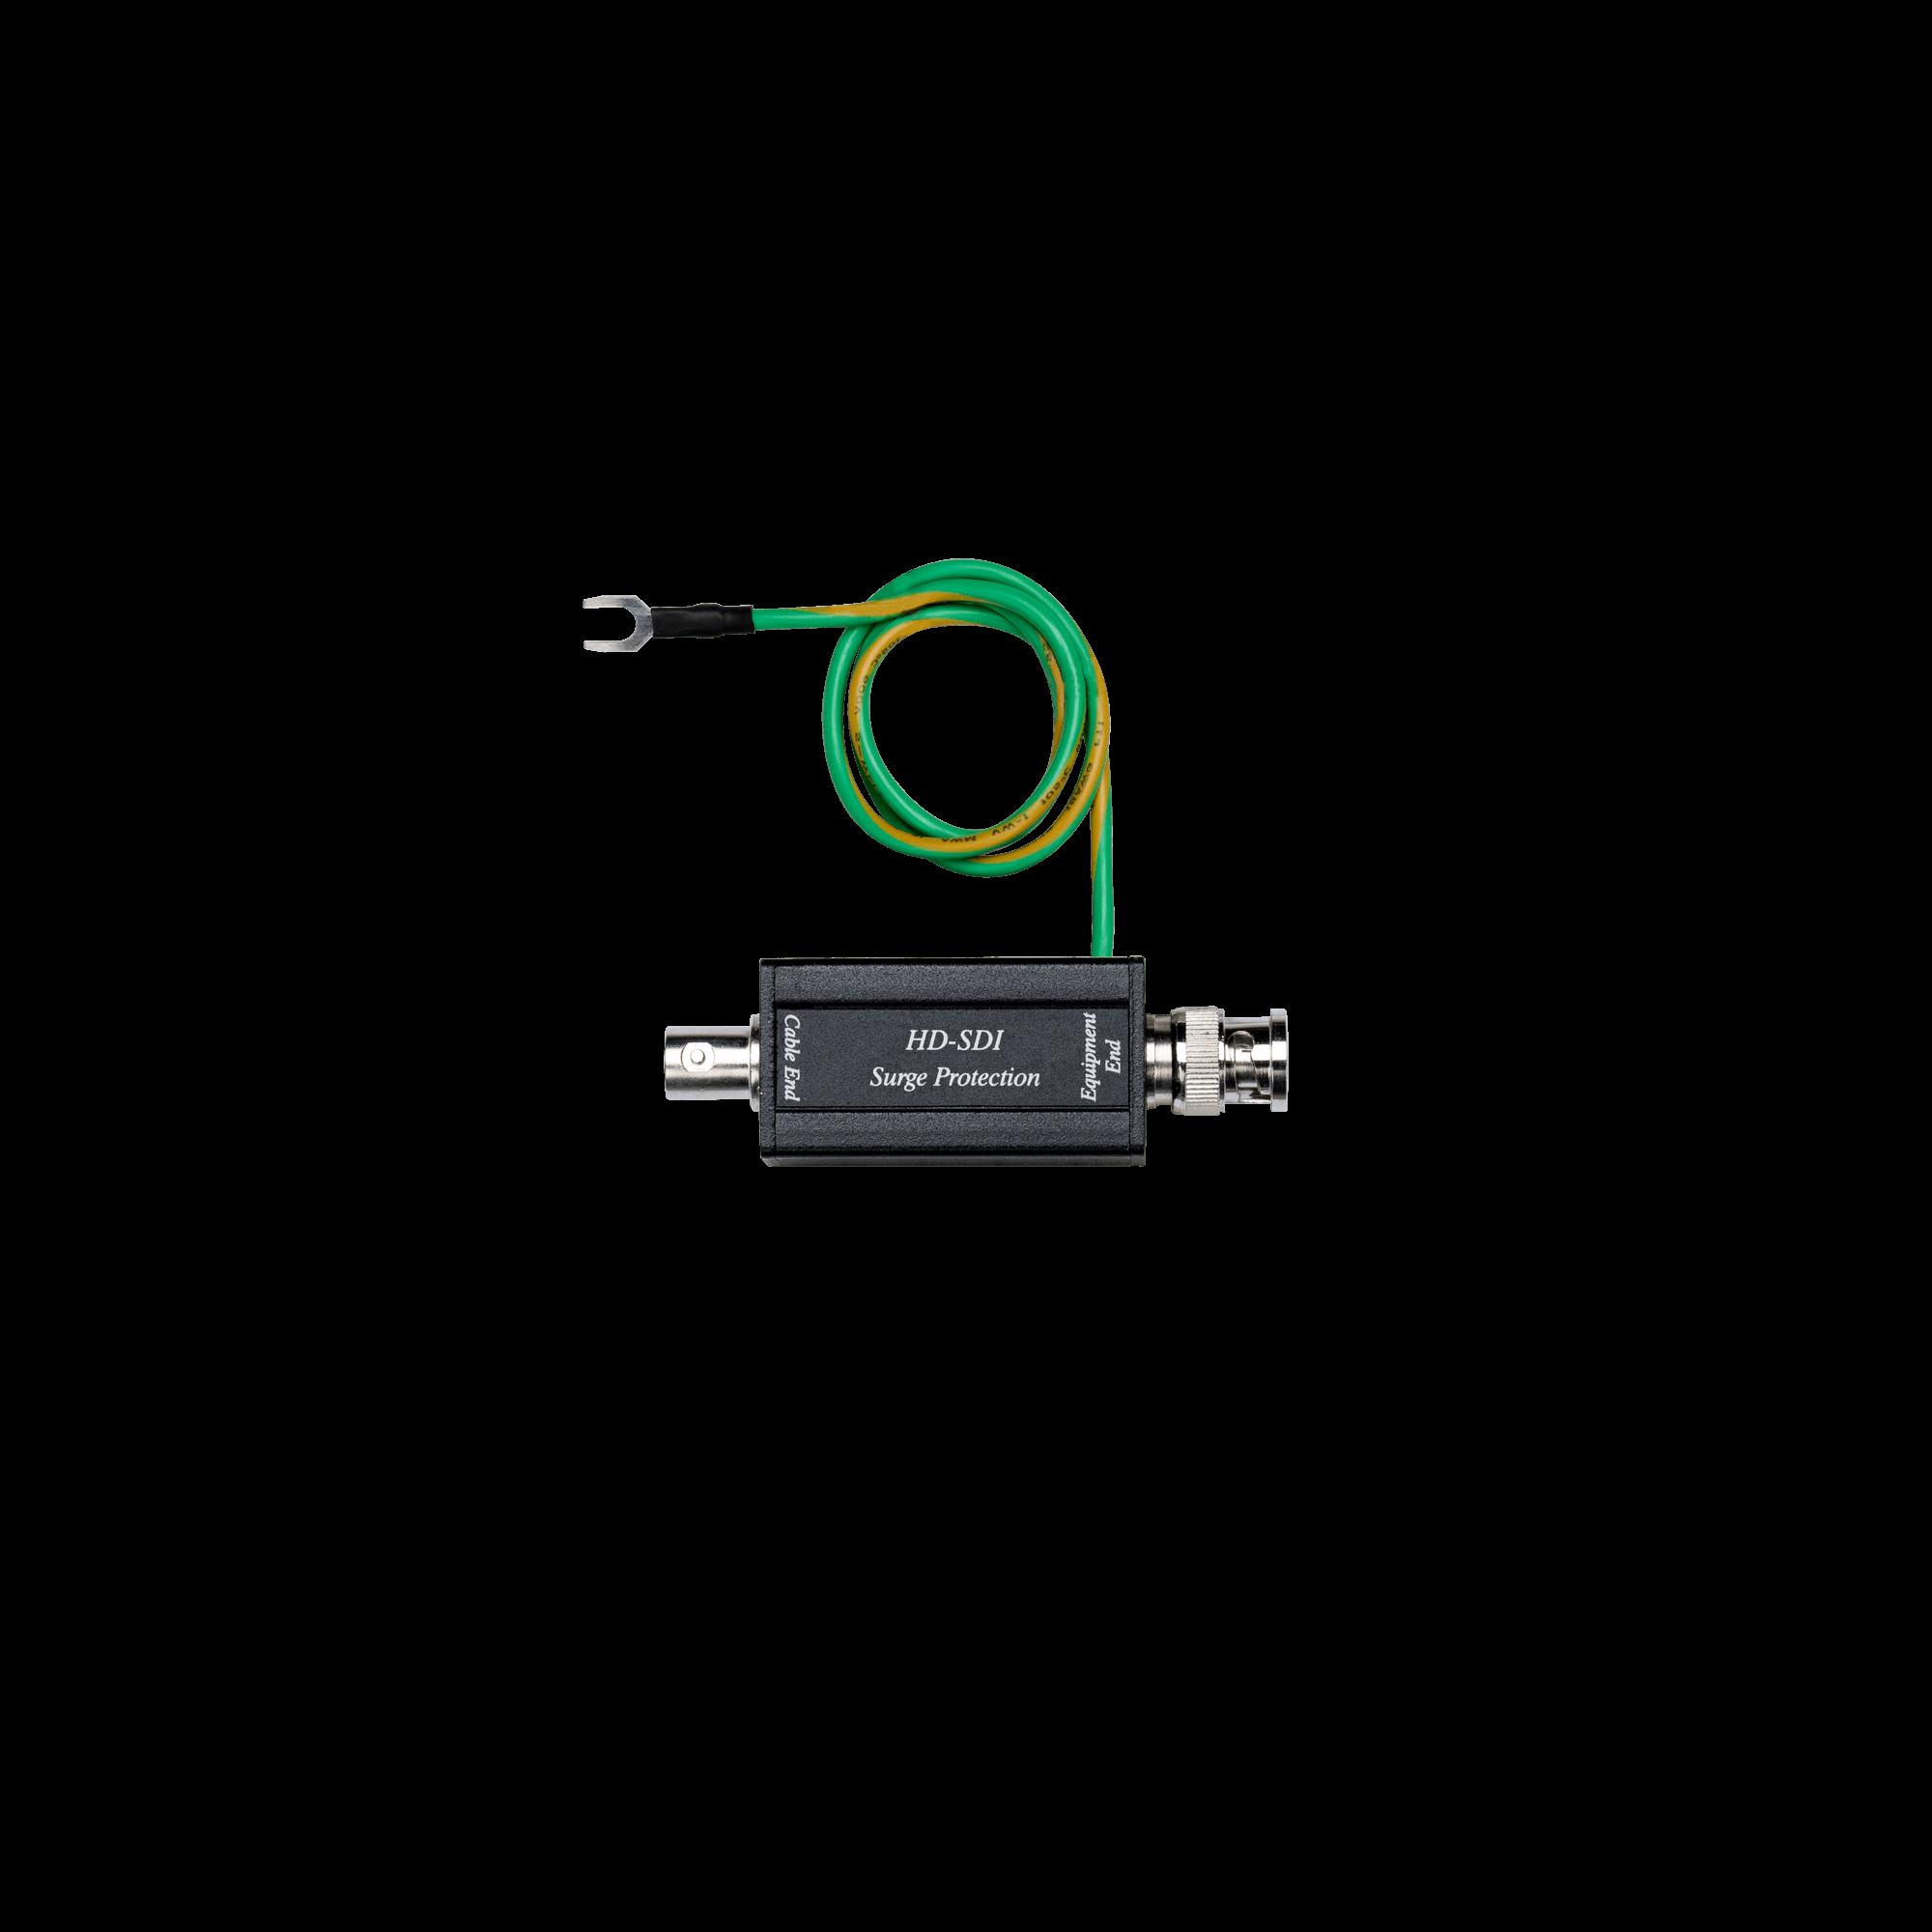 3G/HD-SDI Surge Protector